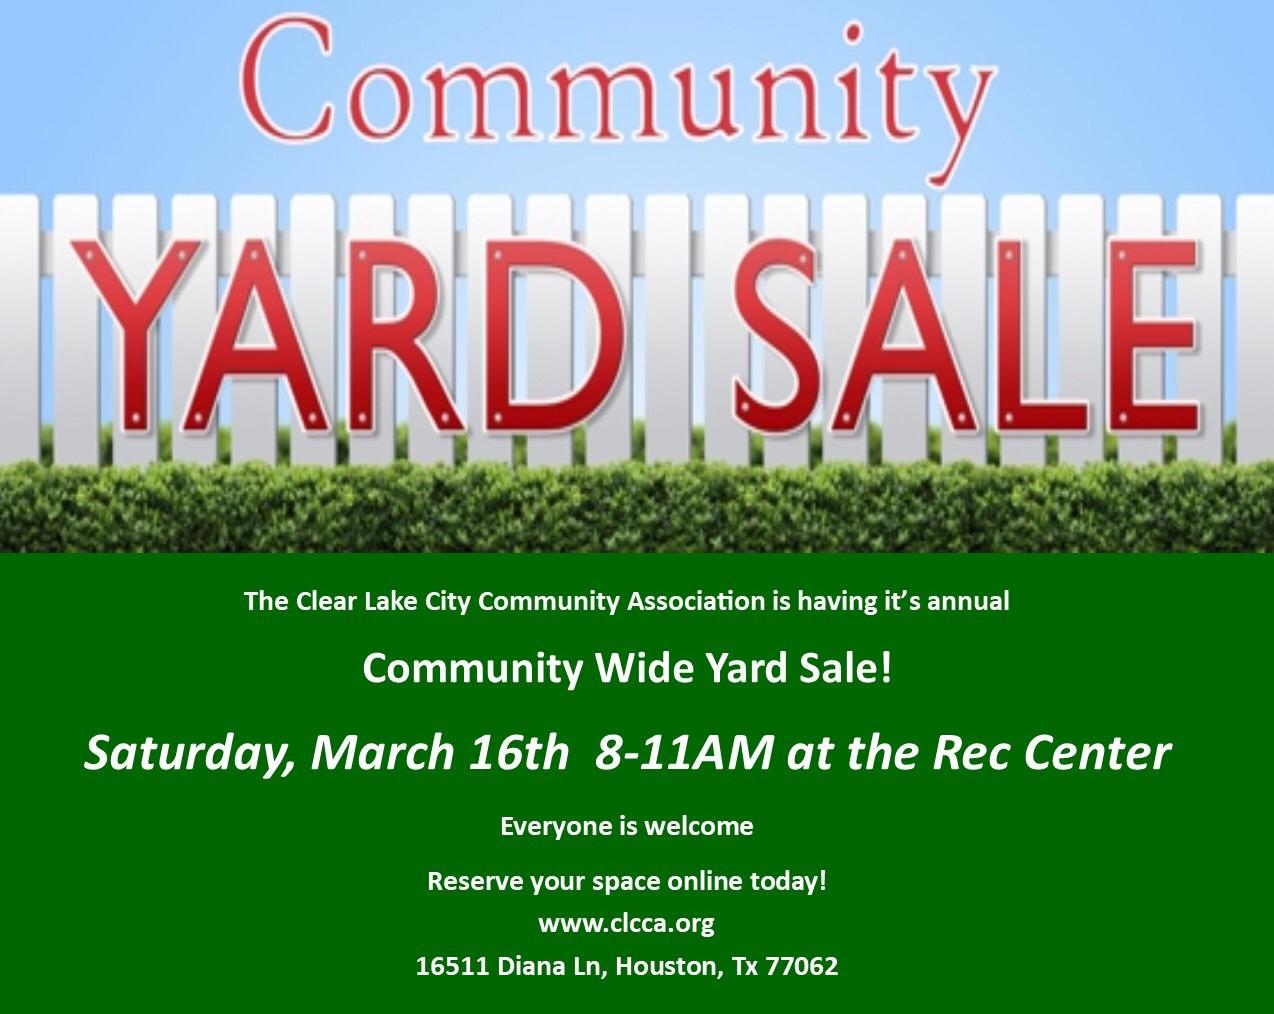 Community Wide Garage Sale - Clear Lake City Community Association